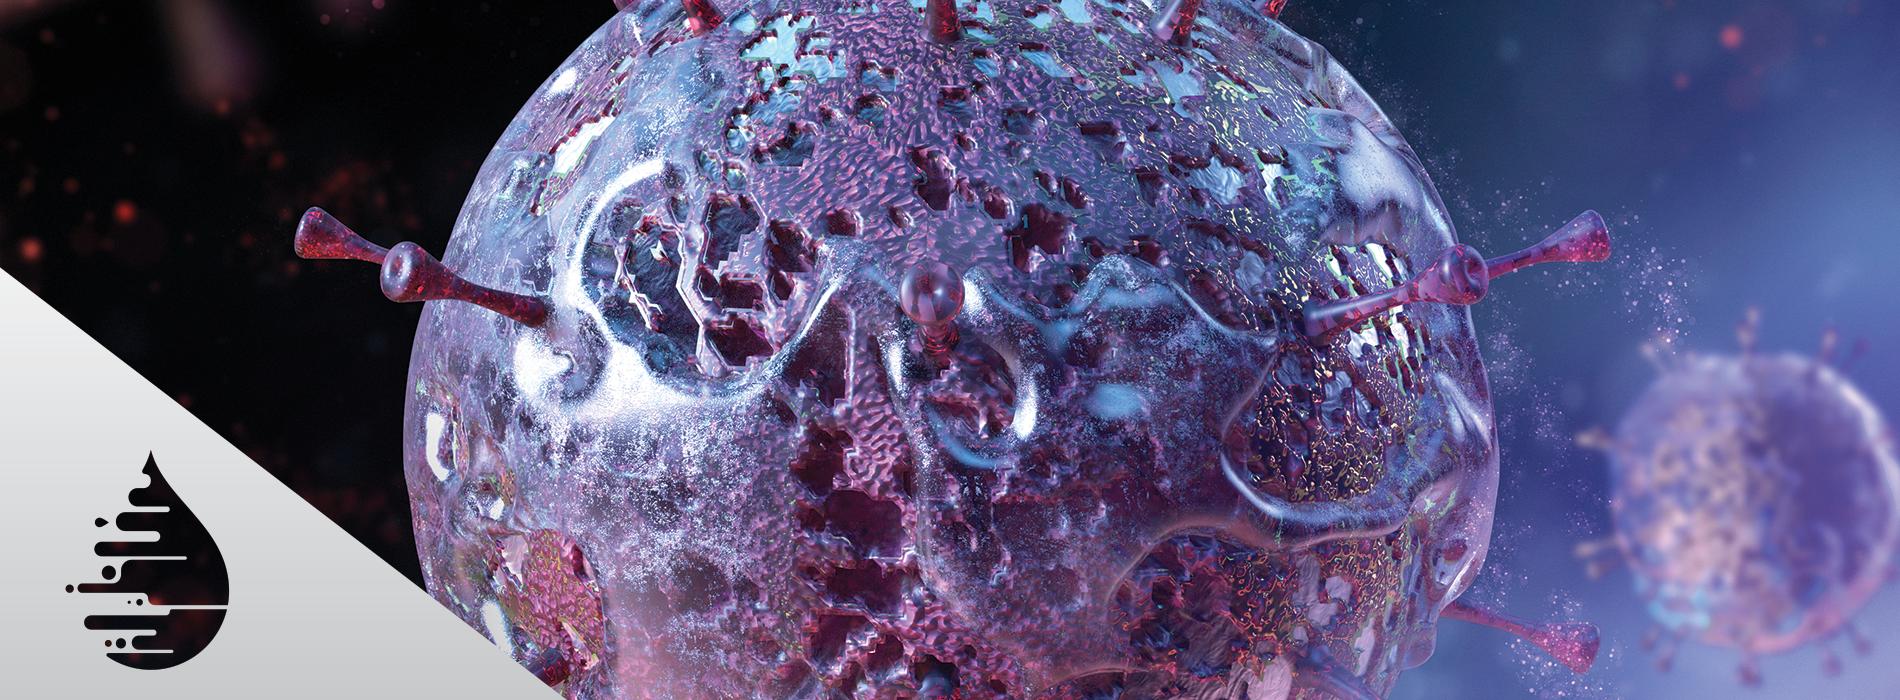 A-slider-liquid